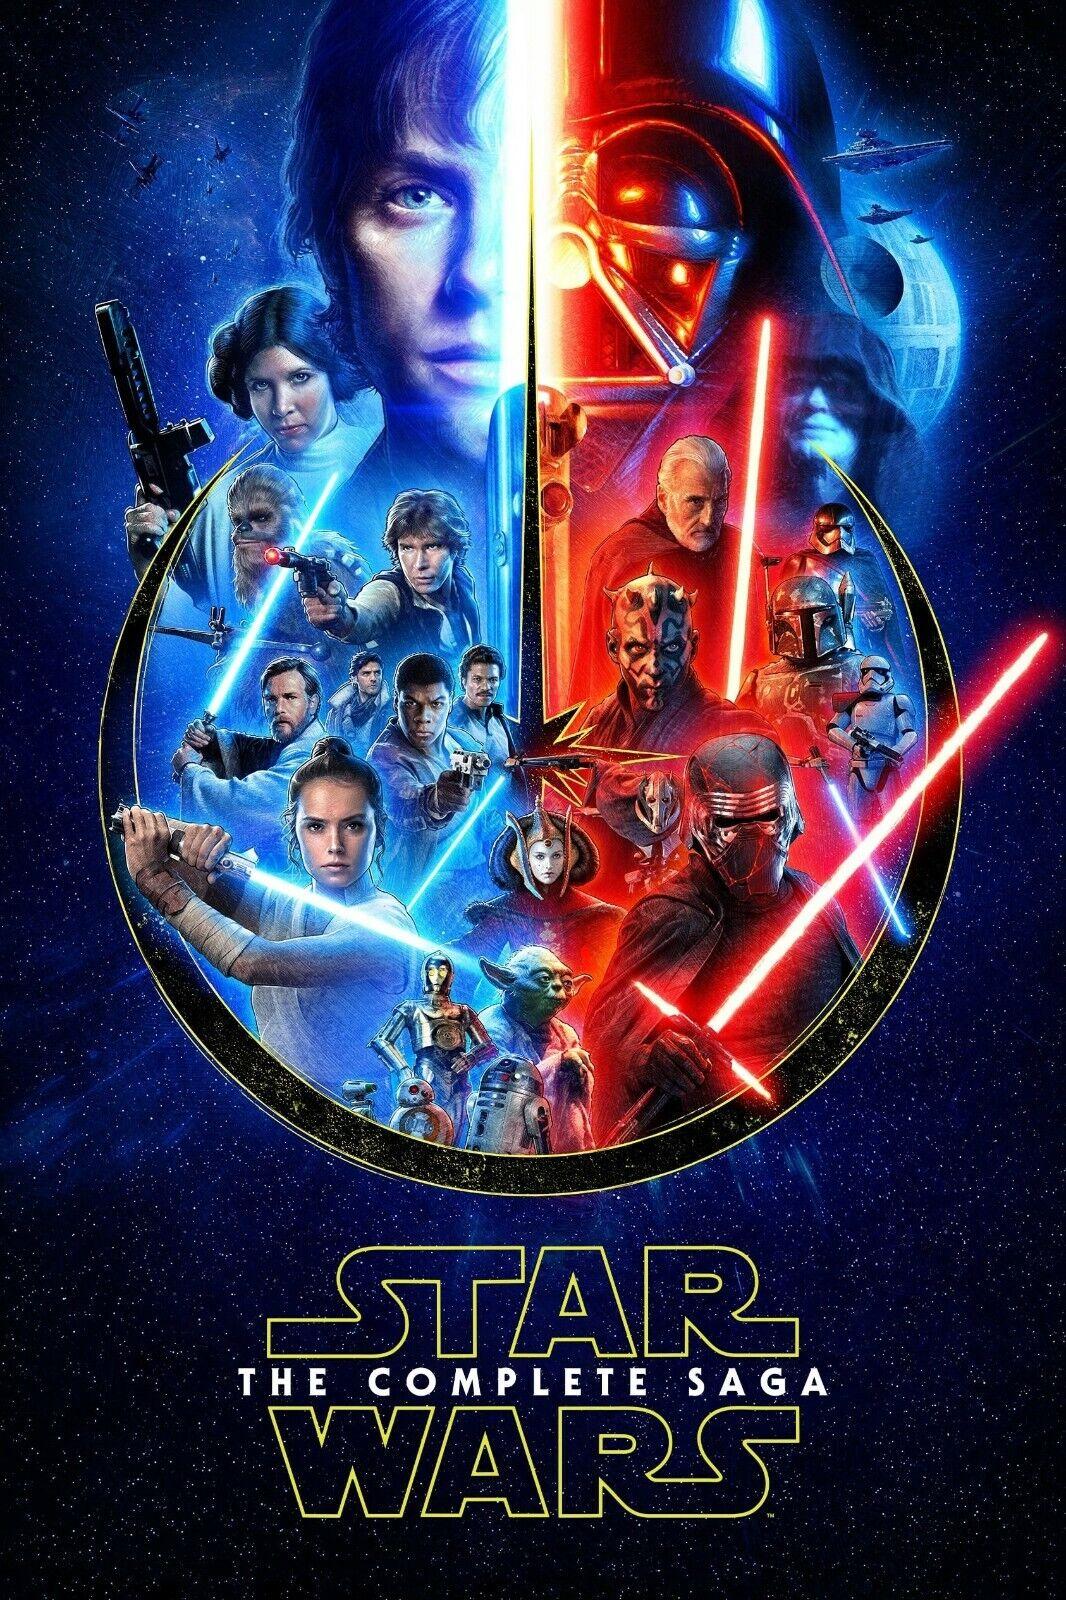 Star Wars: The Complete Saga Movie Poster Wall Art - NEW - 11x17 13x19